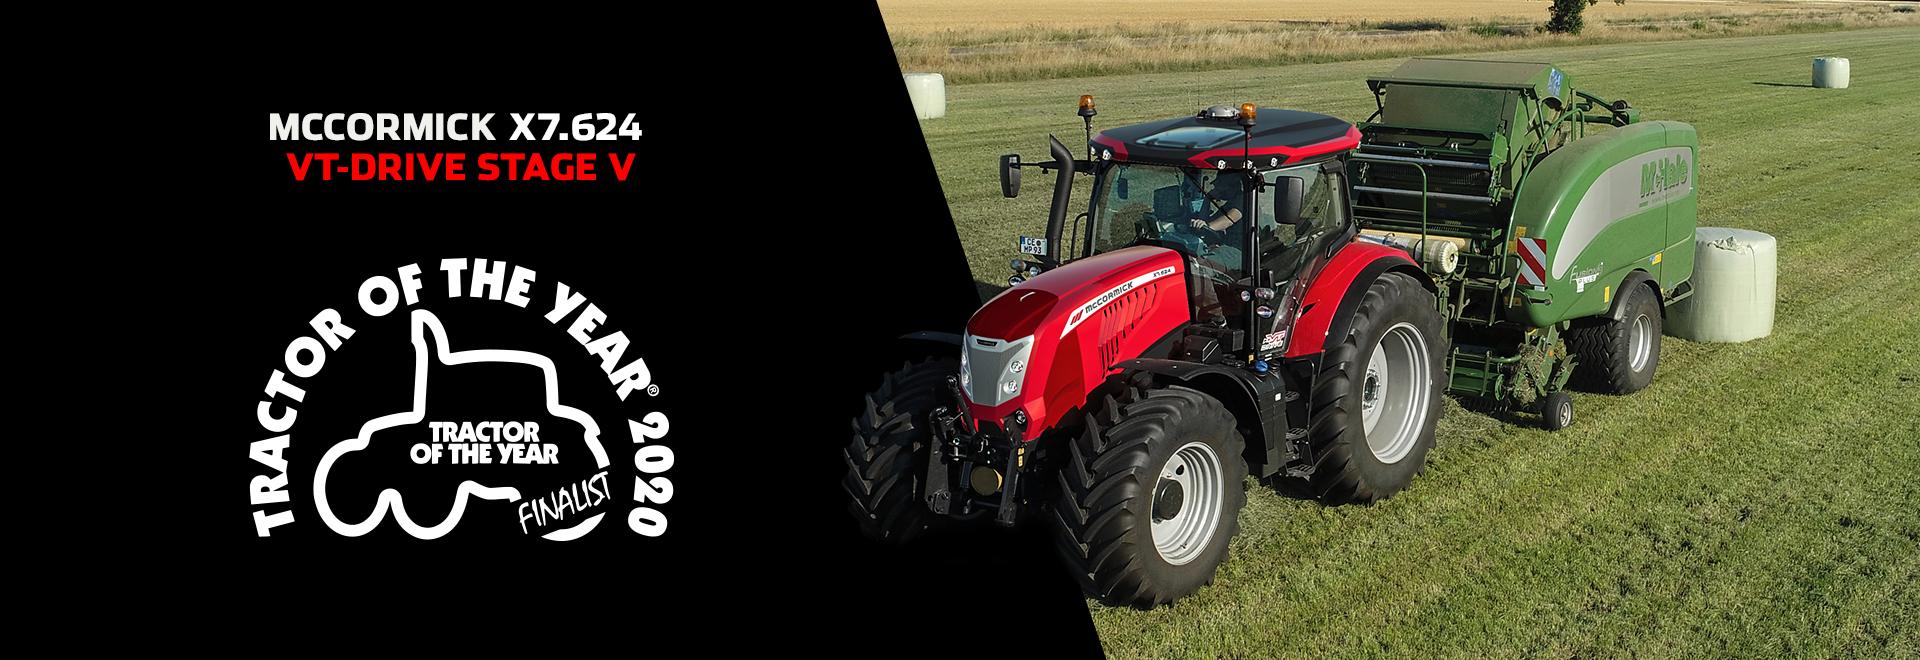 High power tractors - MCCORMICK